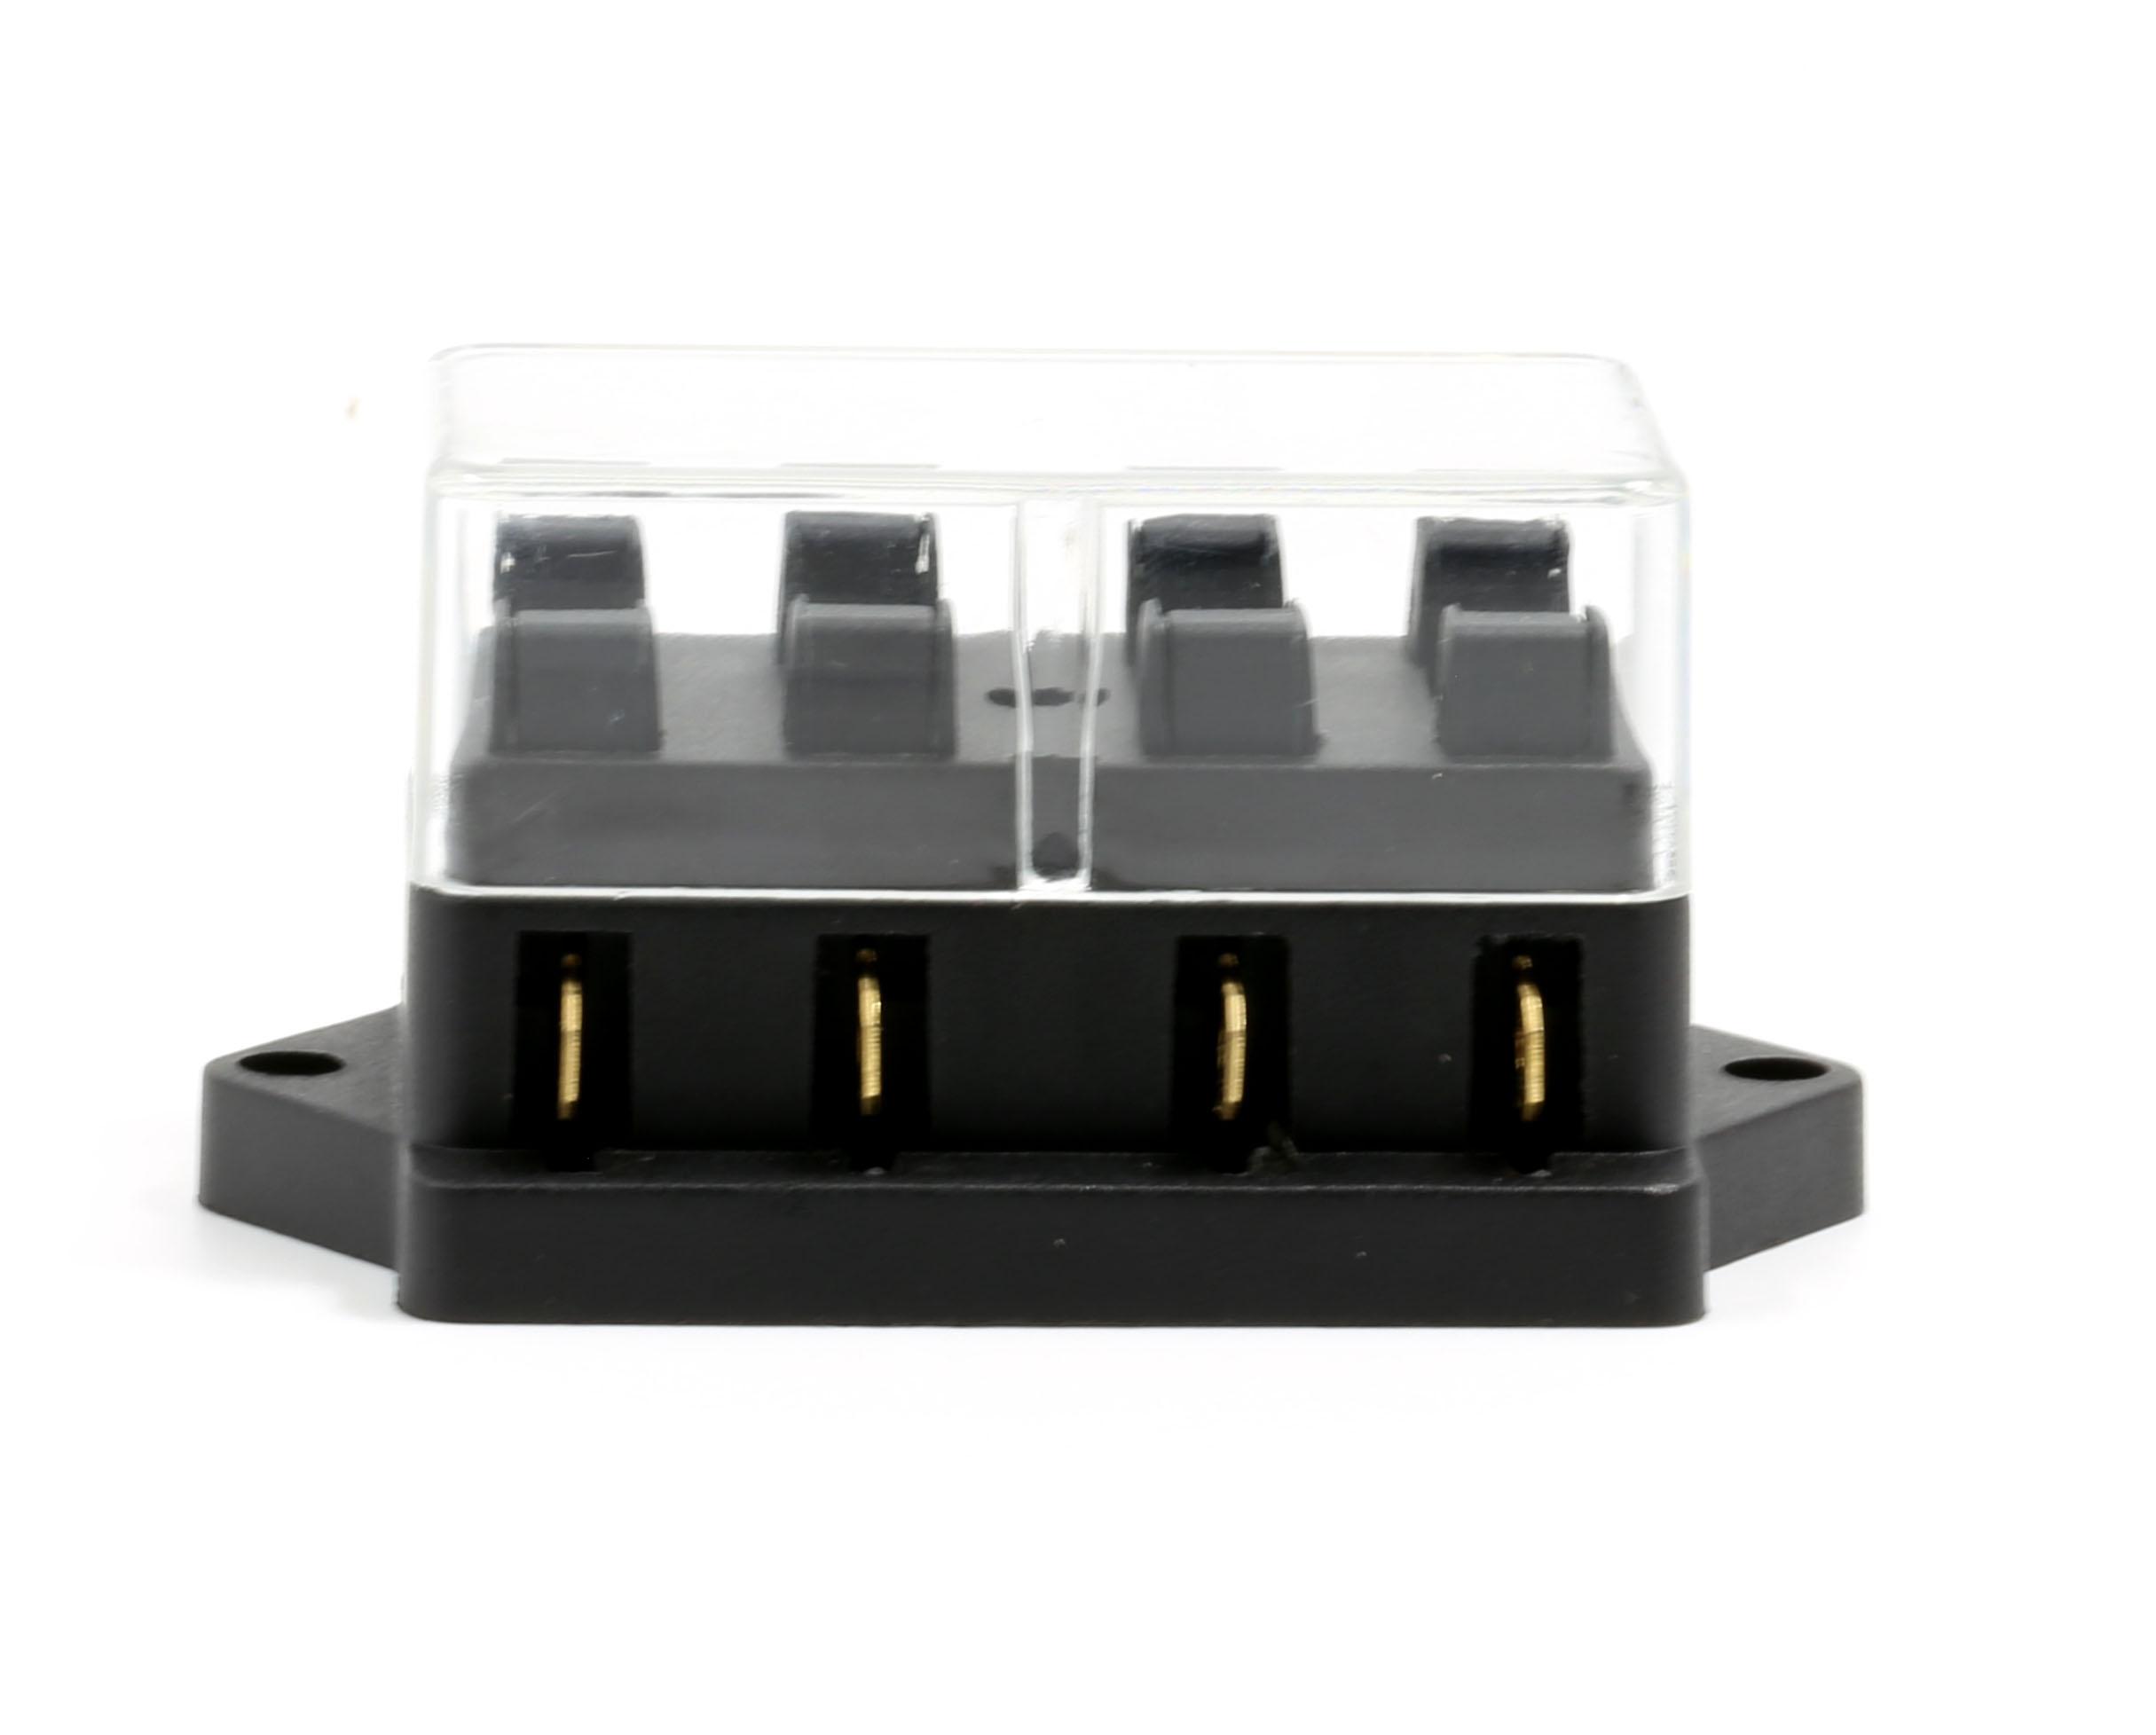 Fuseblock 4port Automotive Fuse Box Connectors Lumision 4 Port Way Ato Atc Apr Block Terminal